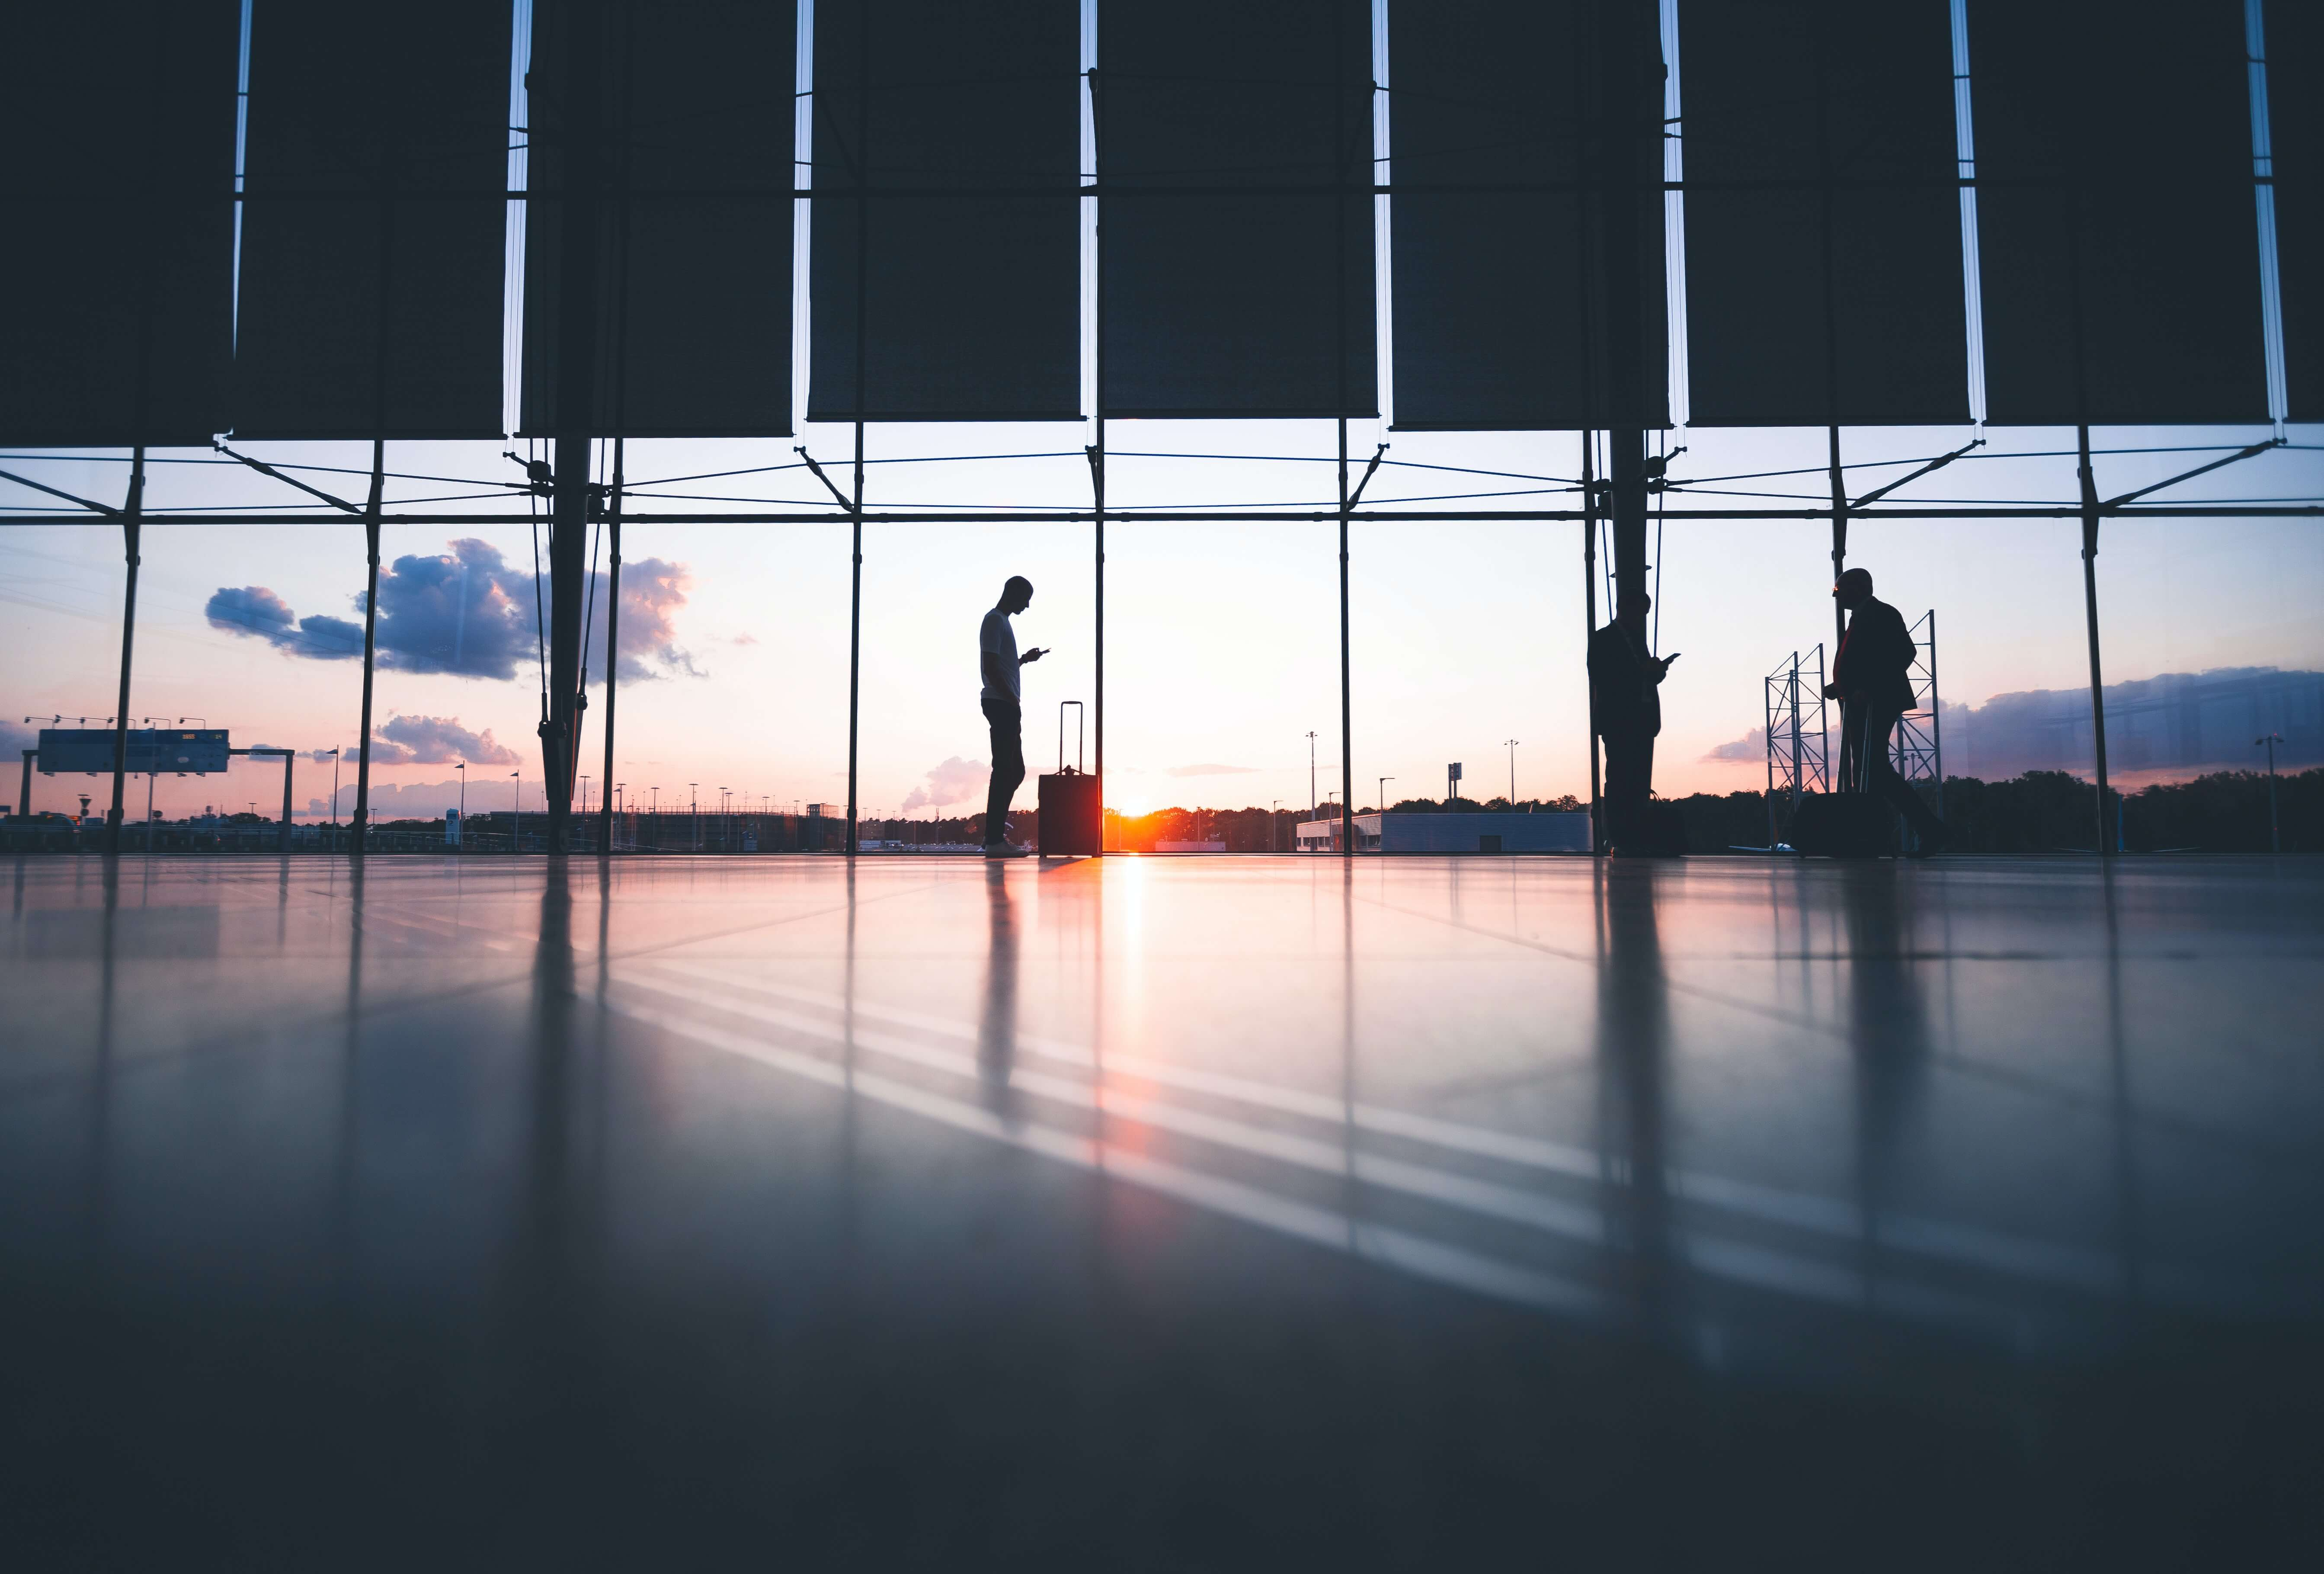 Image d'aeroport vide